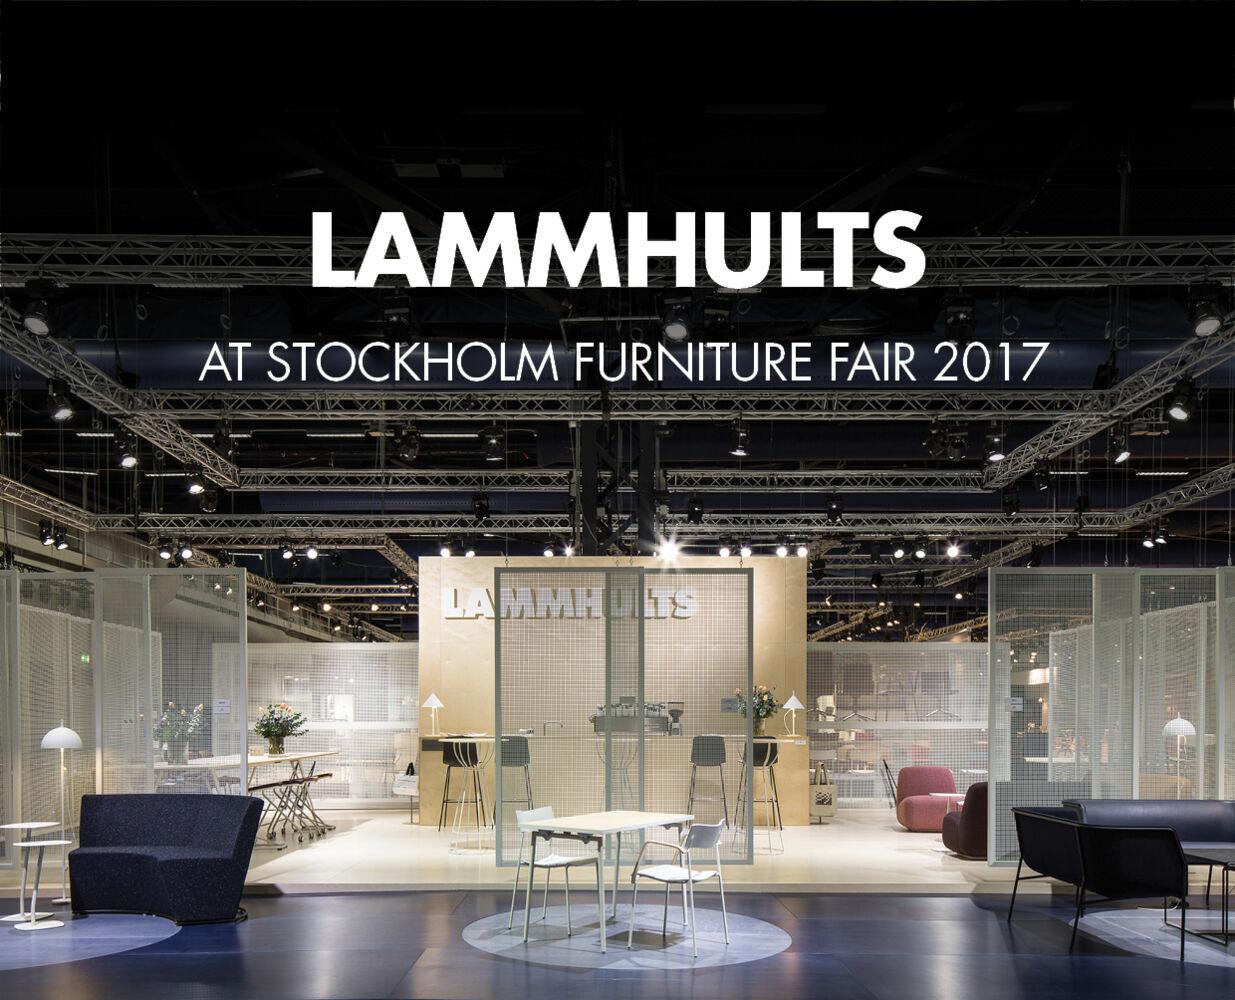 Superfolk A Stockholm Furniture Fair : Stockholm furniture fair news stories lammhults